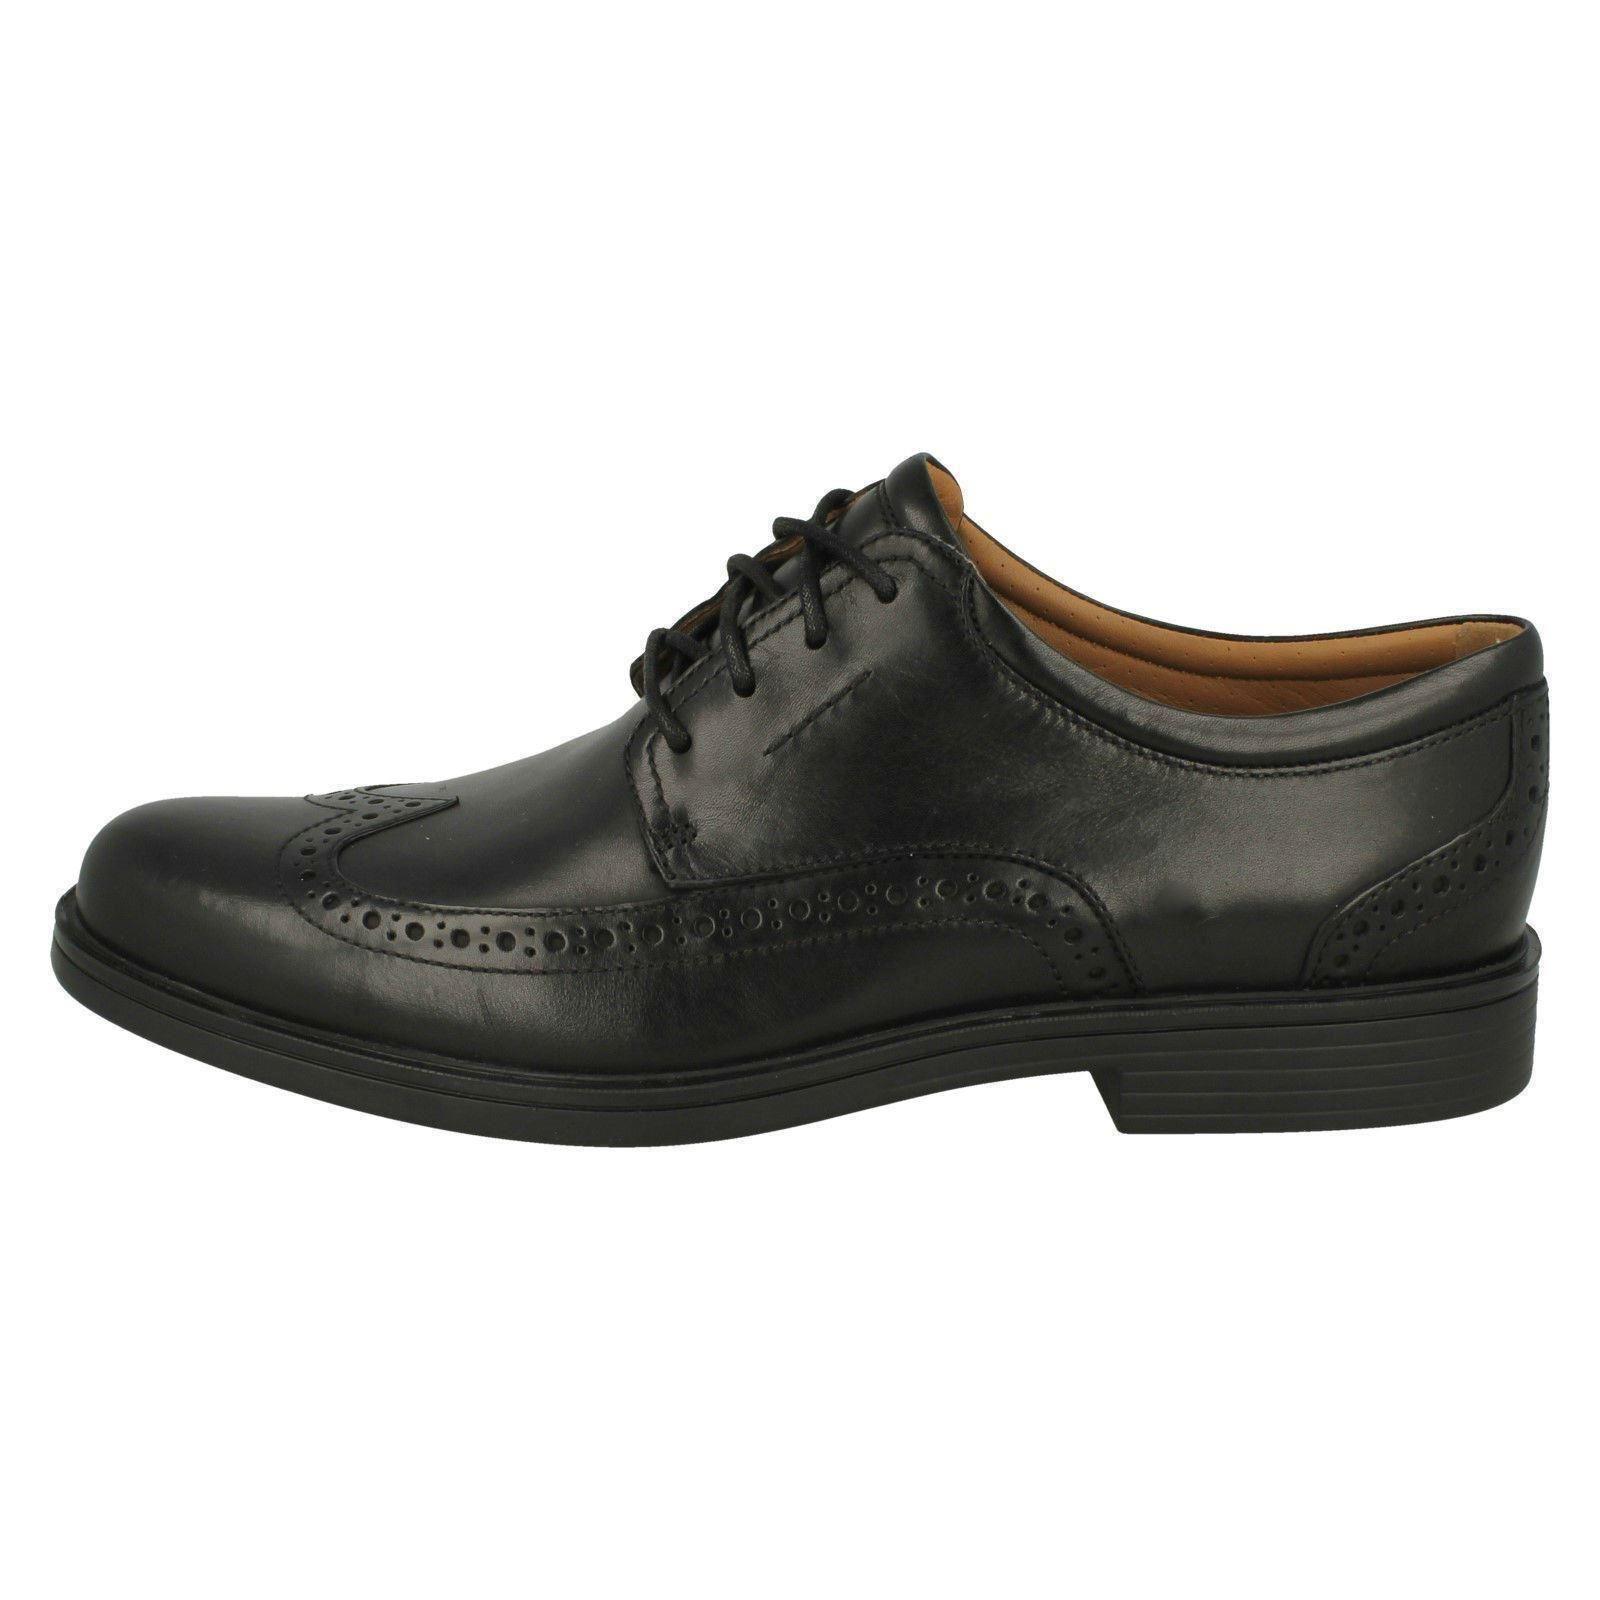 Aldric Wing para Black Formal Shoes Tip Un Clarks hombre UqaWgxRwR0